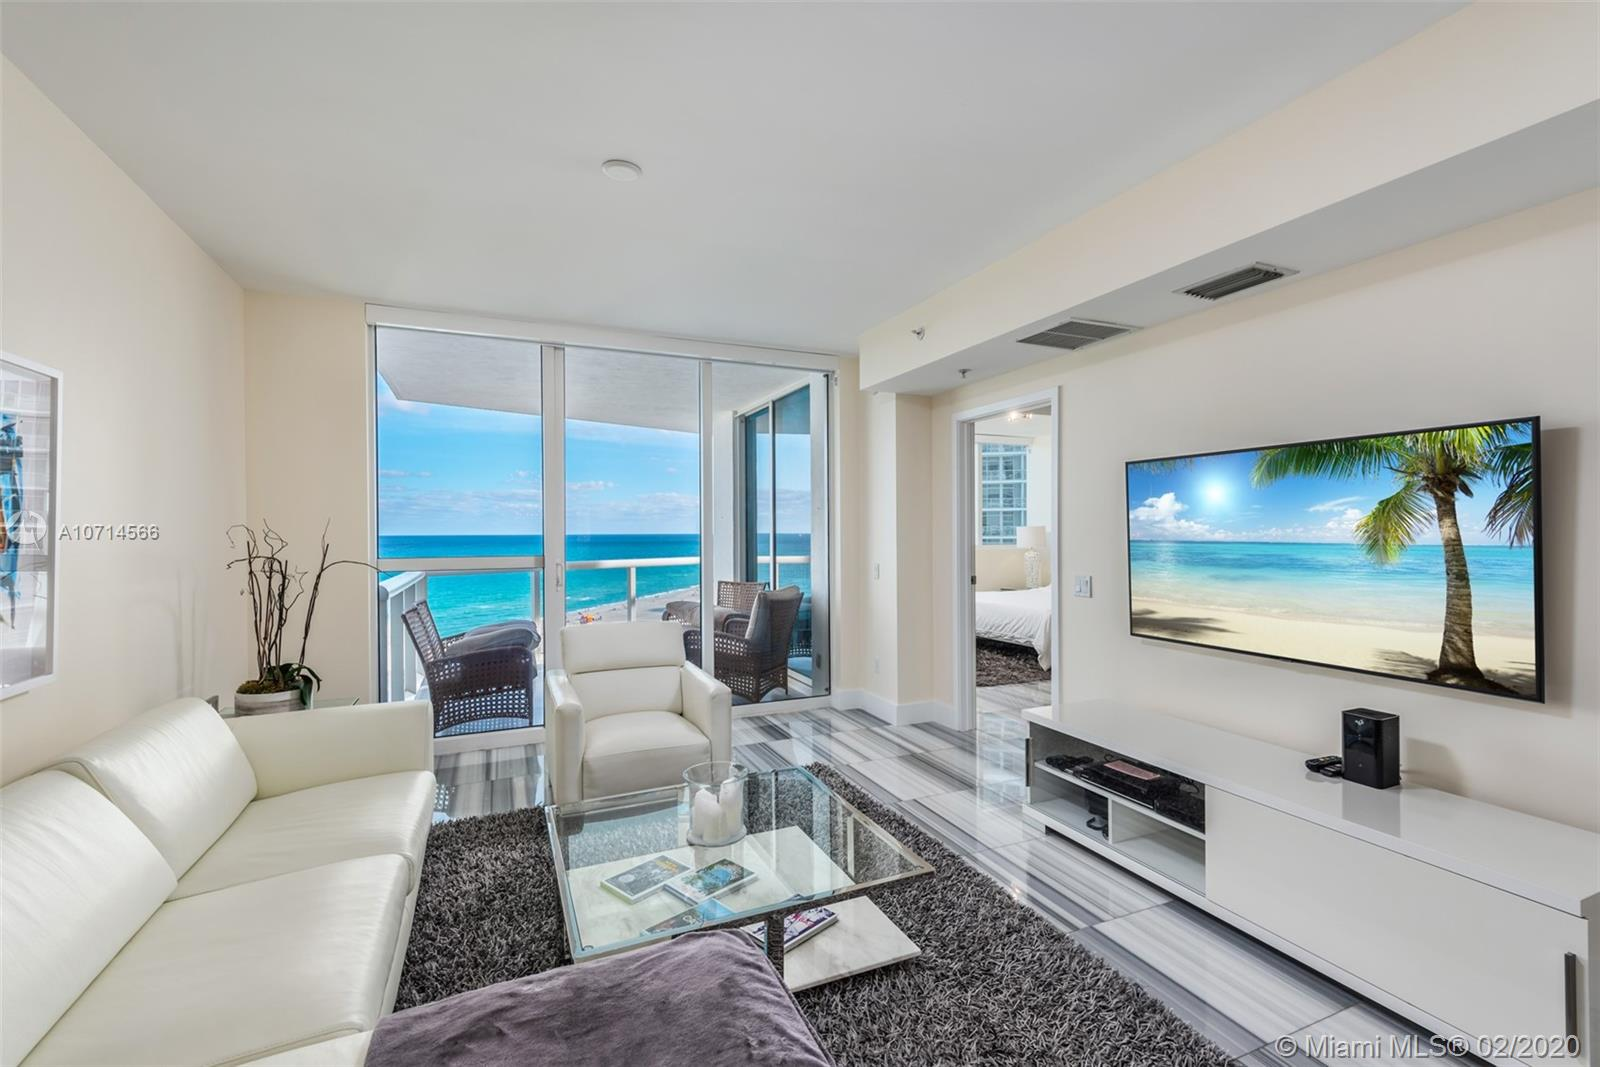 3801 Collins Ave, 1202 - Miami Beach, Florida